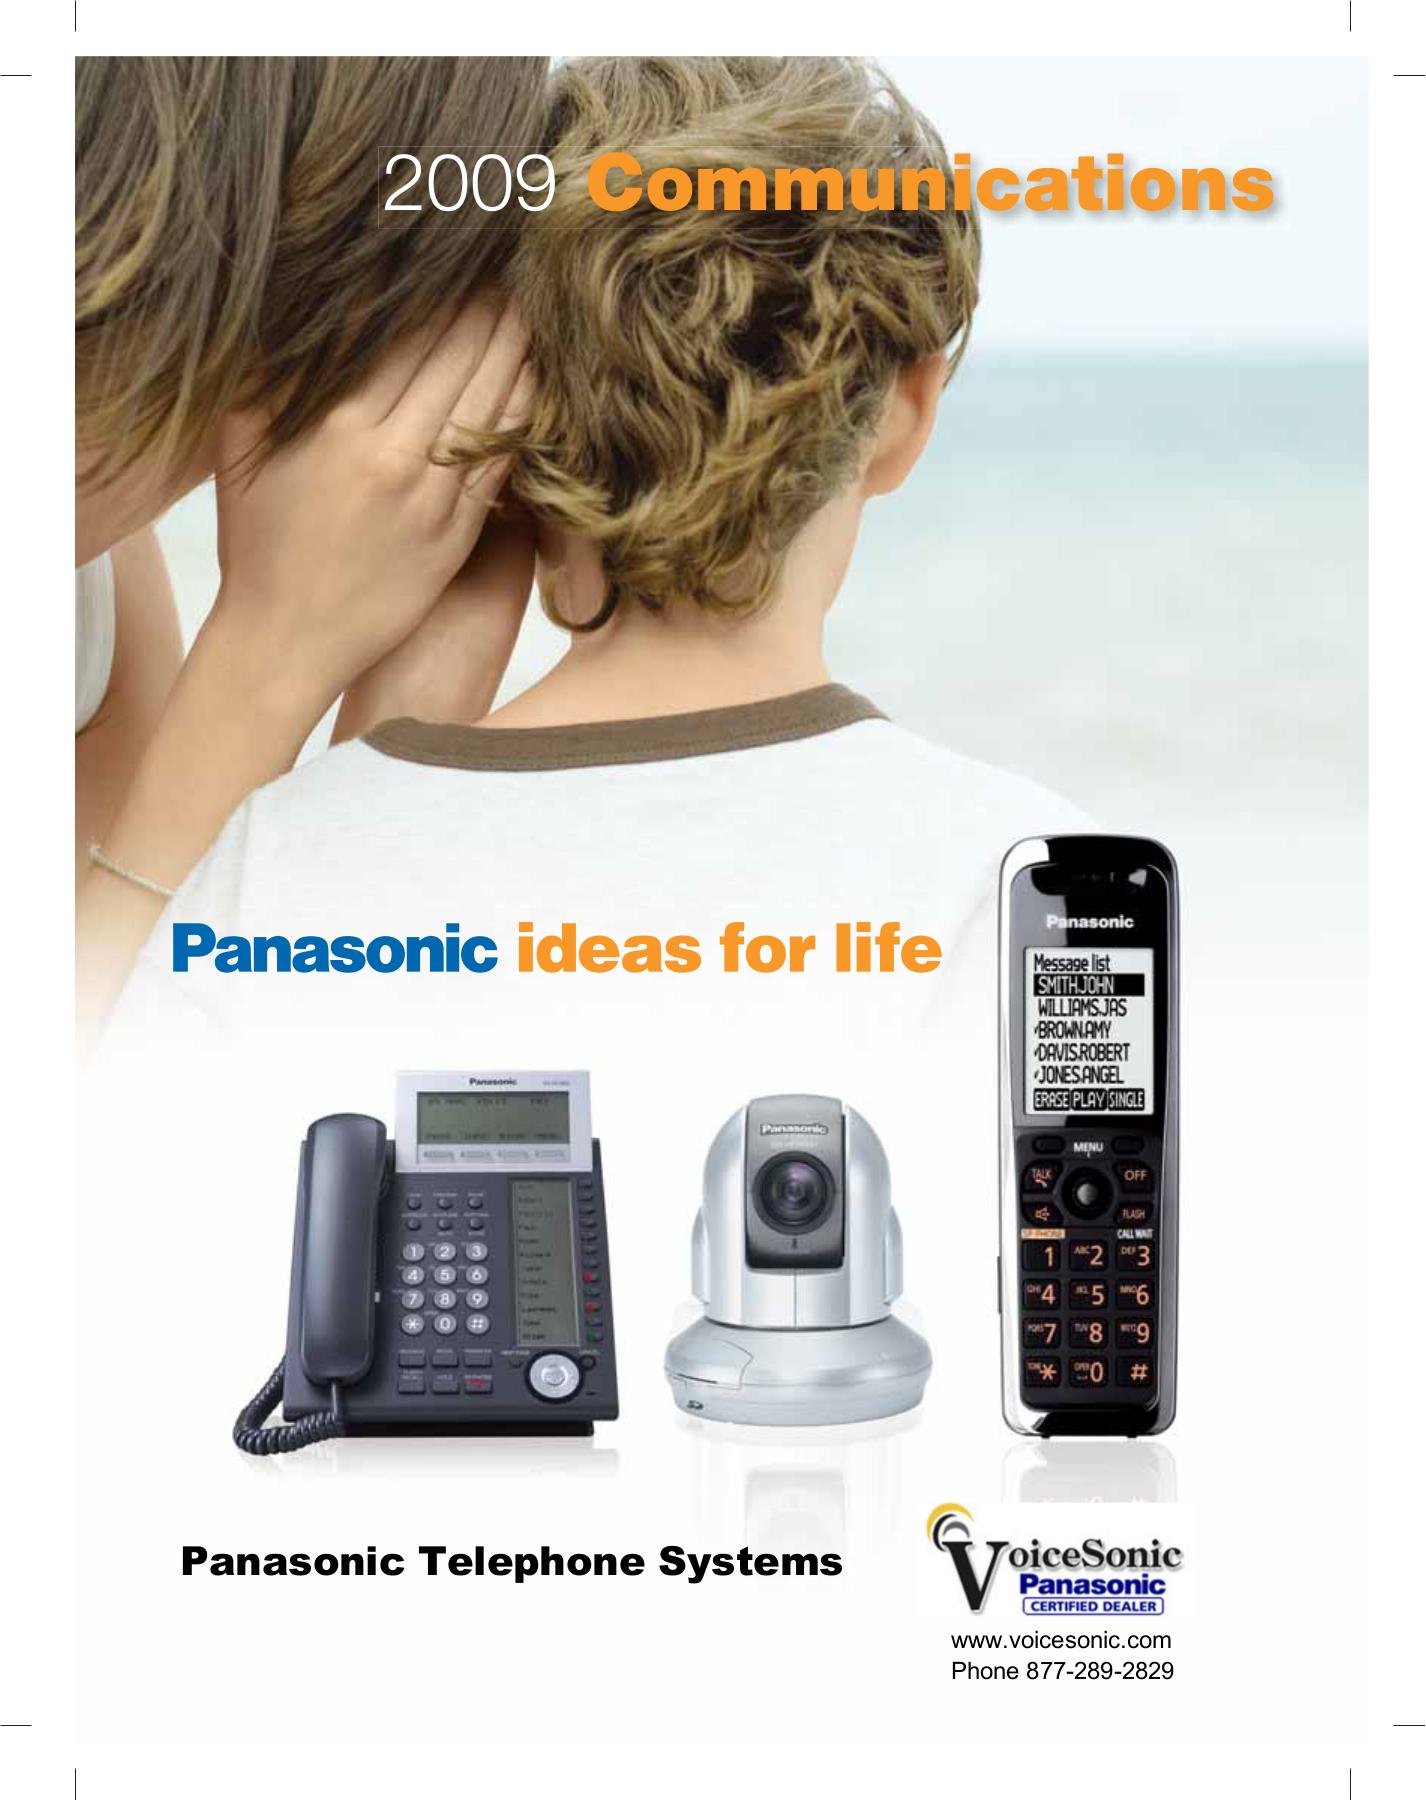 Manual telefono panasonic kx-tg3031b.